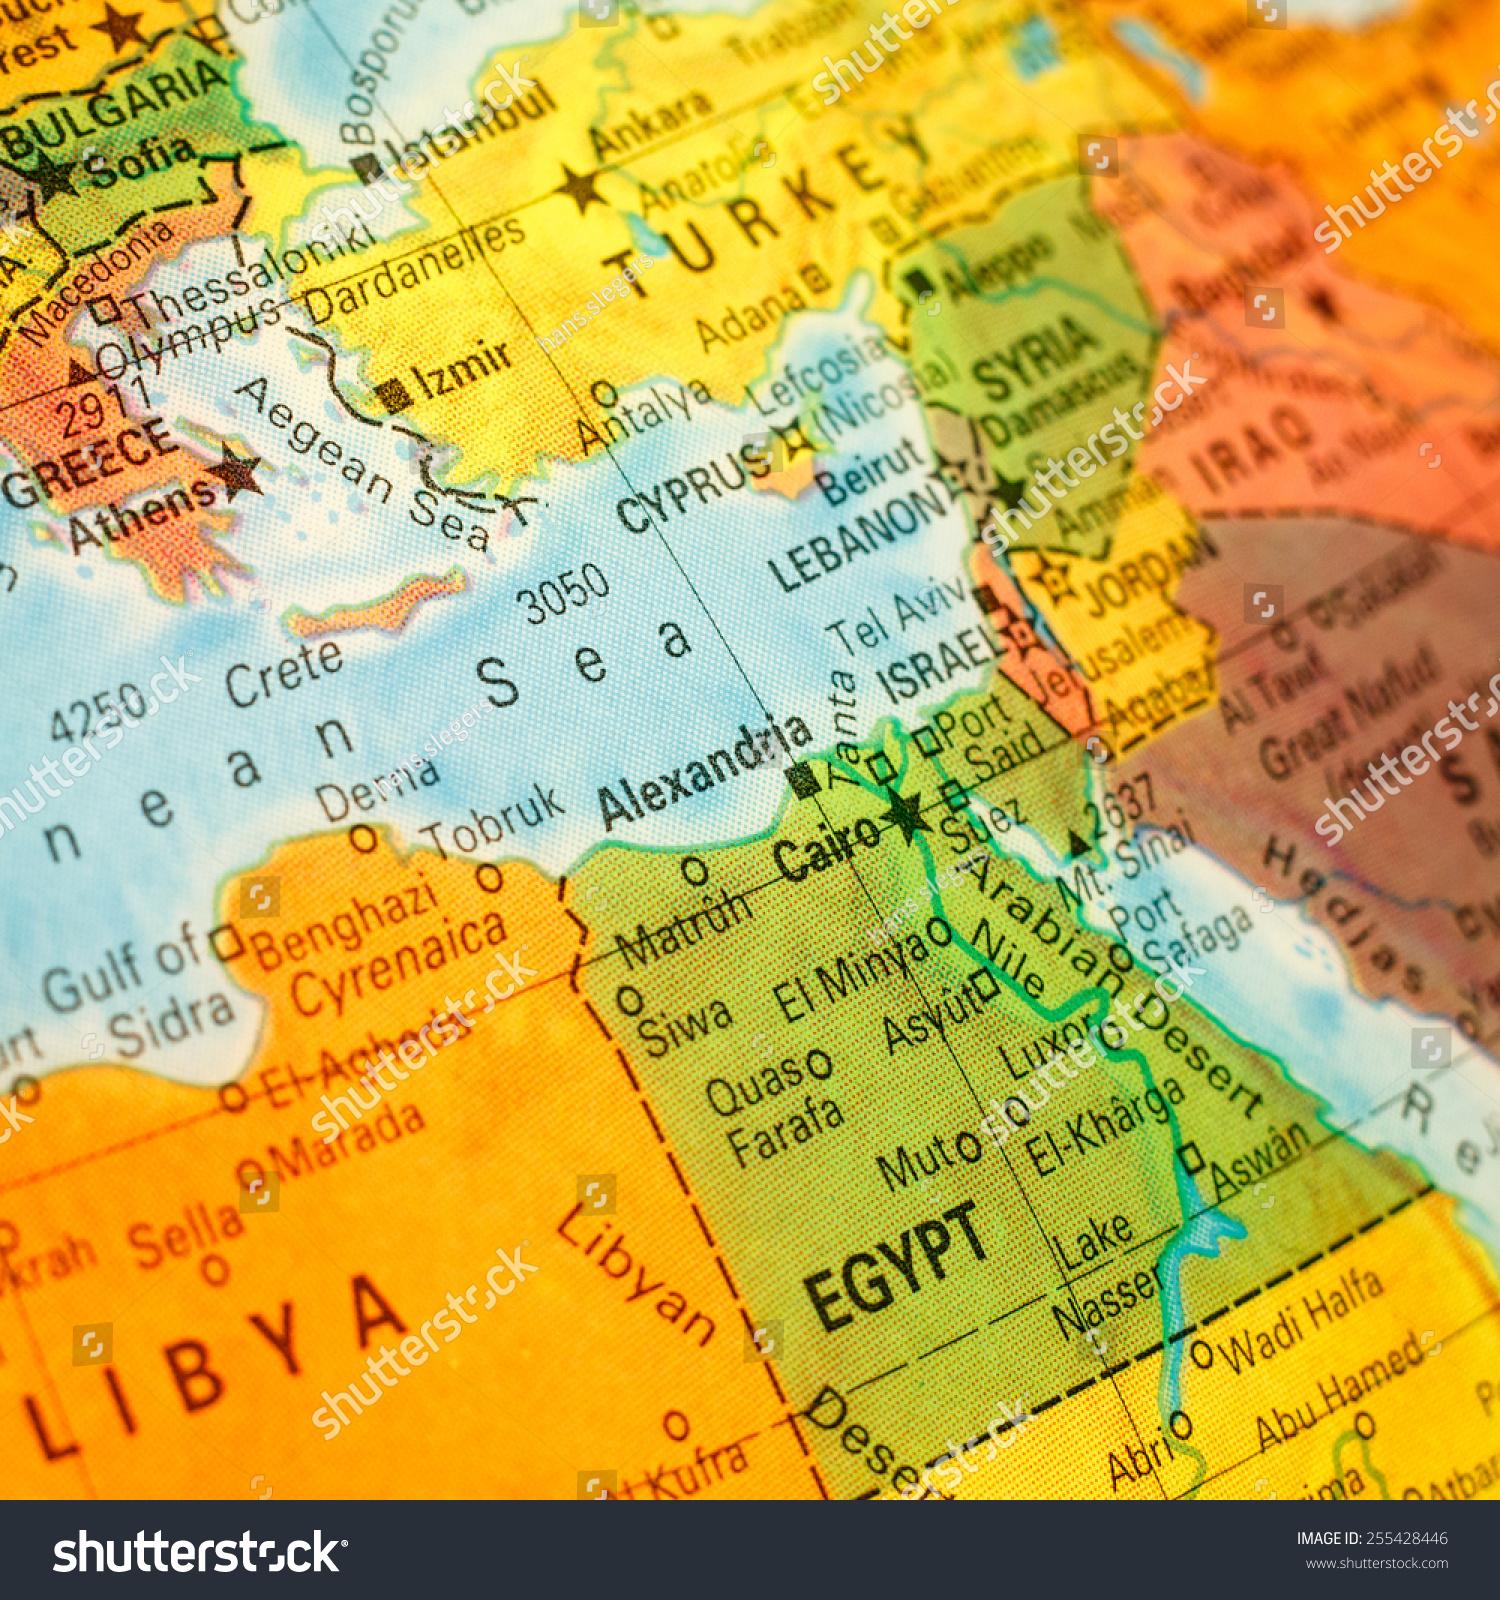 Where Is Egypt On The Map Hilton Waikoloa Village Map Tempe Az Map - Map of egypt landmarks